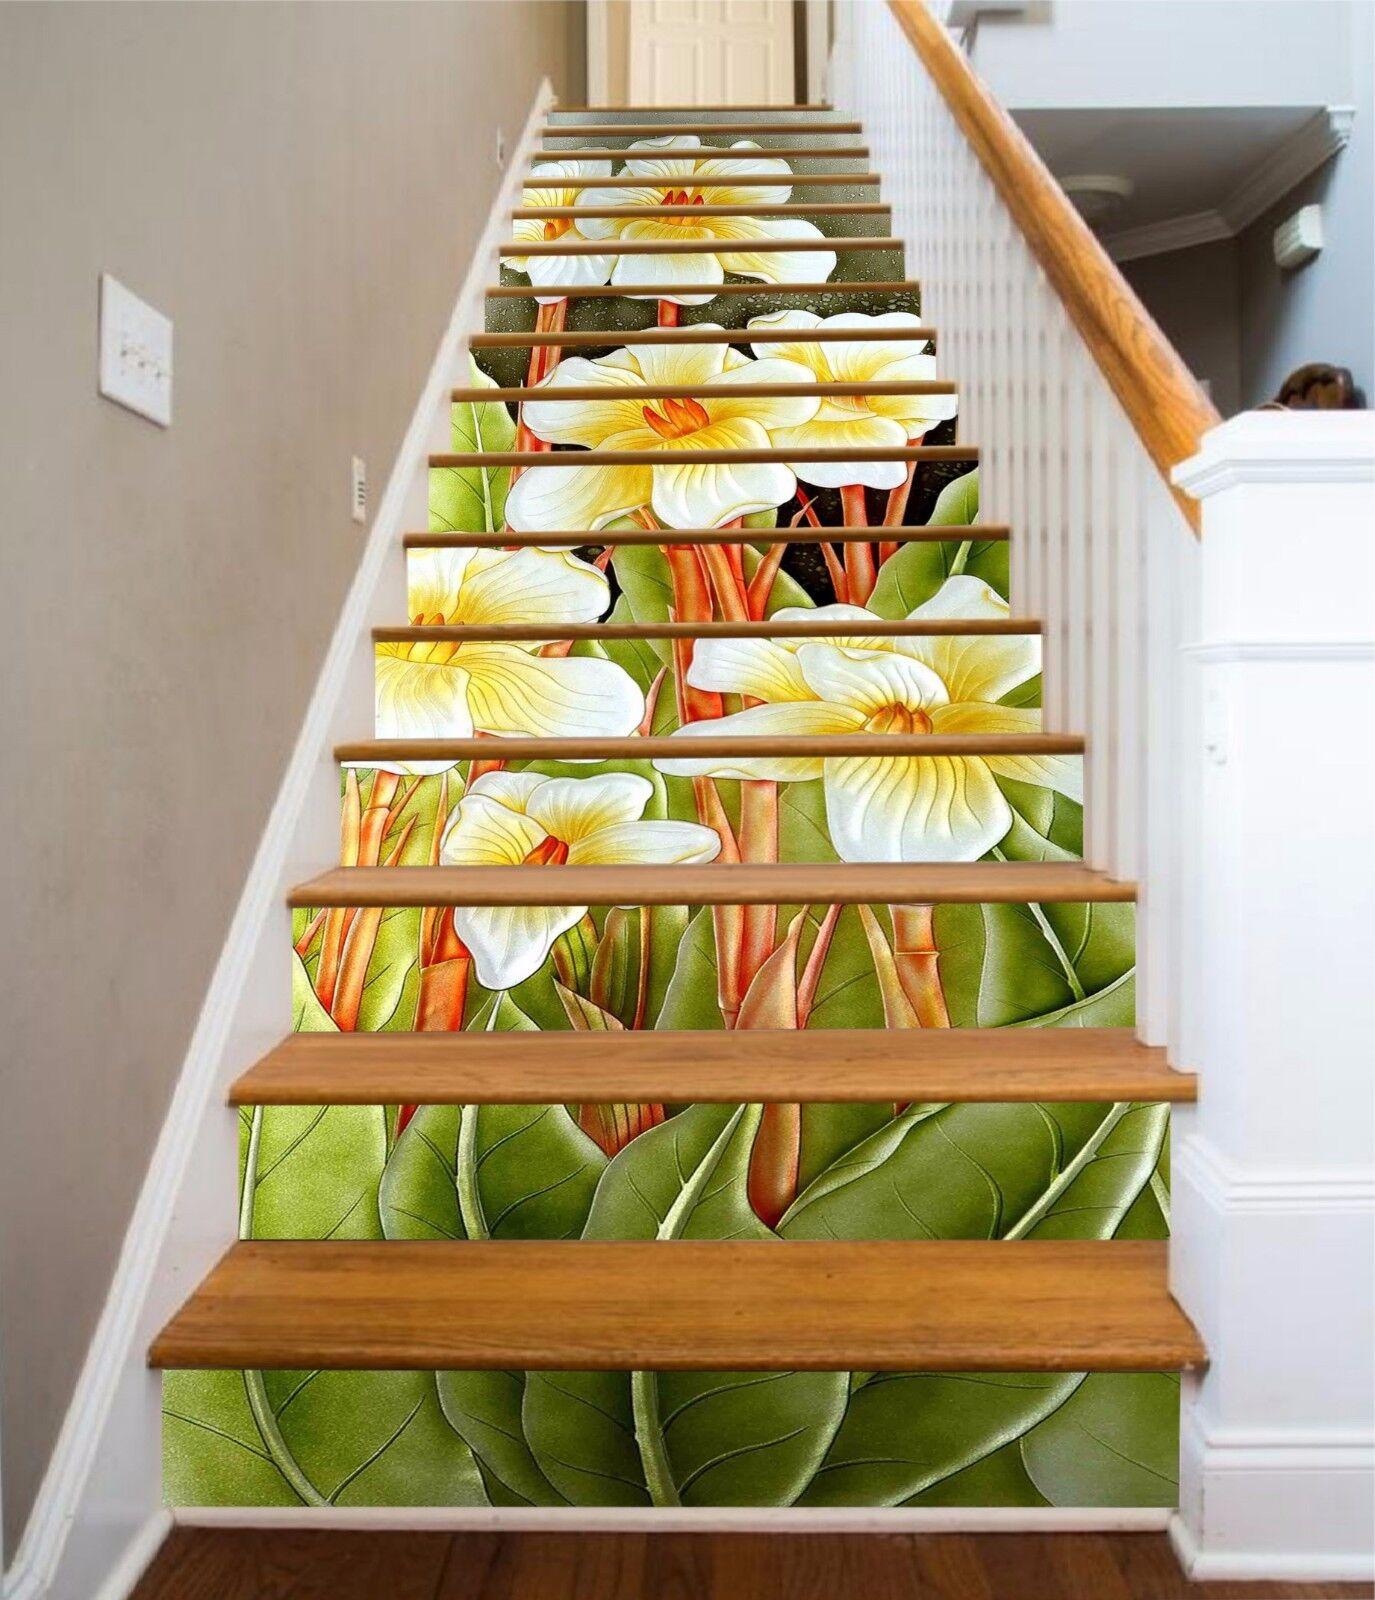 3D Flower leaf 335 Stair Risers Decoration Photo Mural Vinyl Decal WandPapier UK